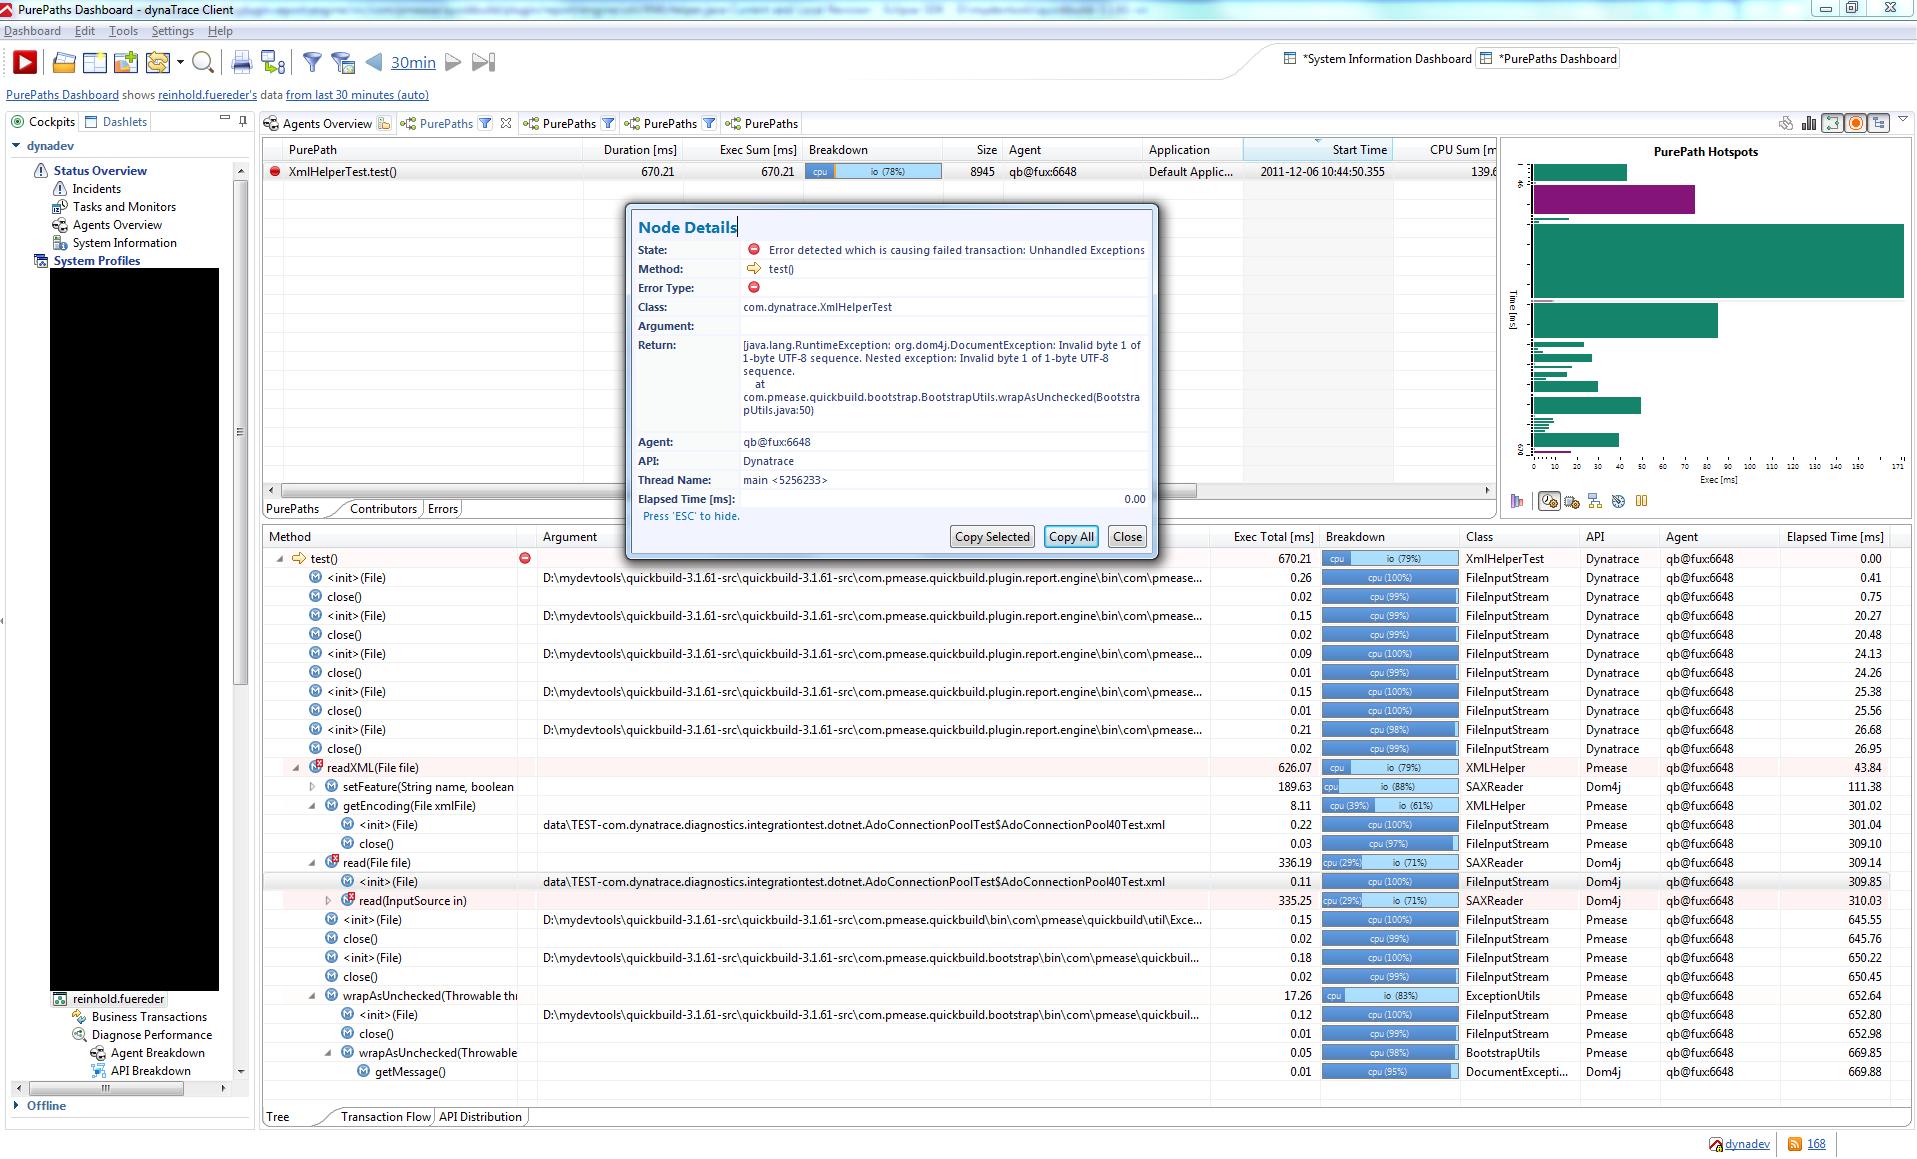 Svn merge invalid status for updating properties